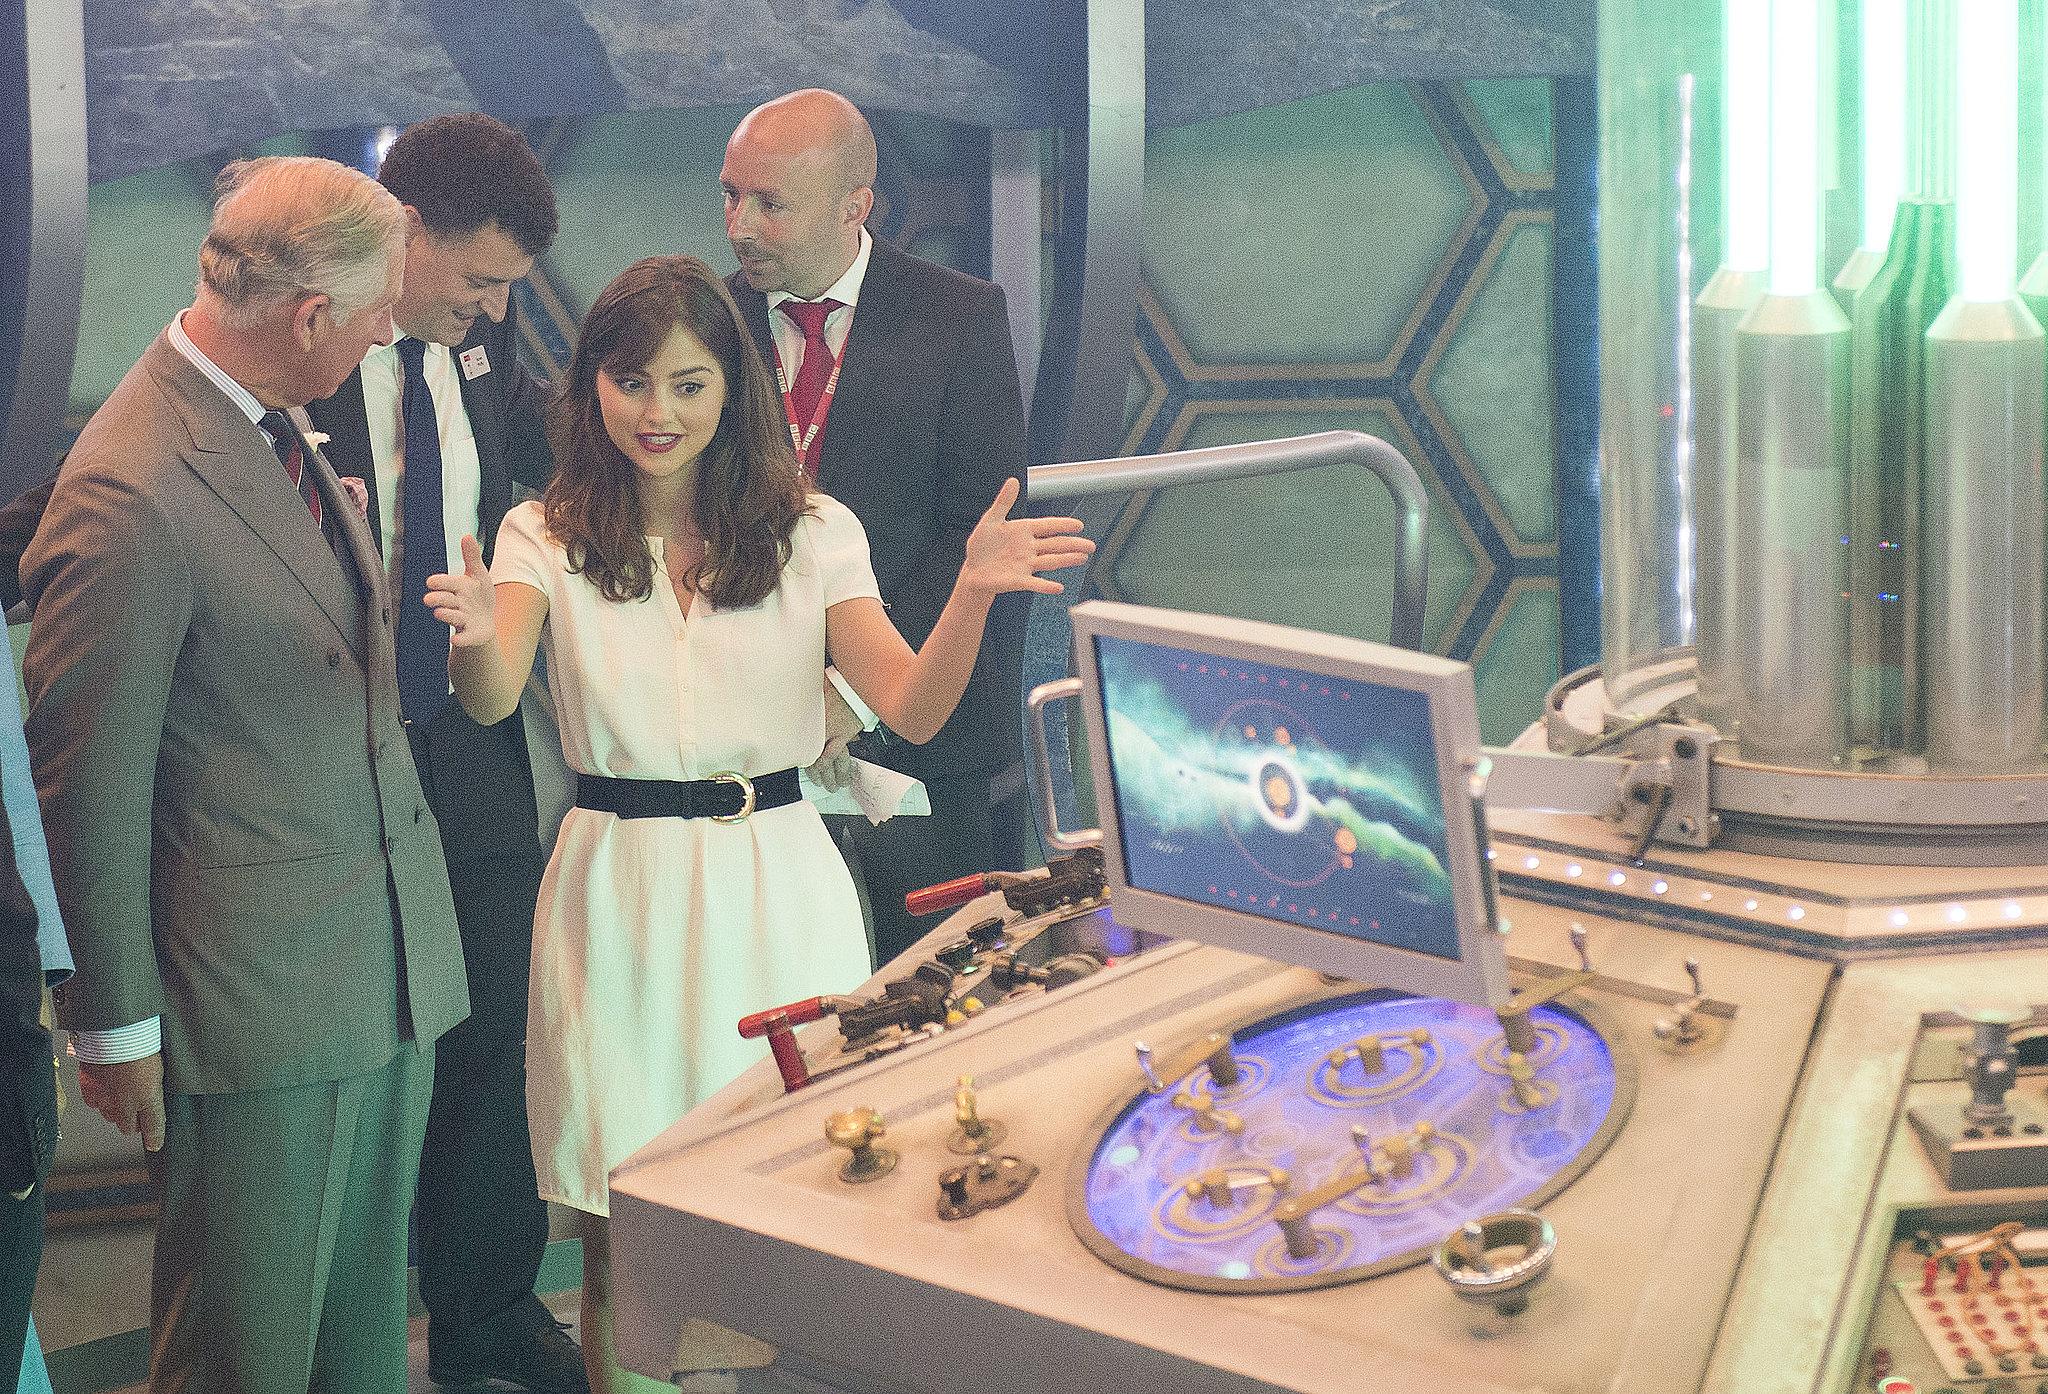 Talking sonic screwdrivers in the TARDIS.